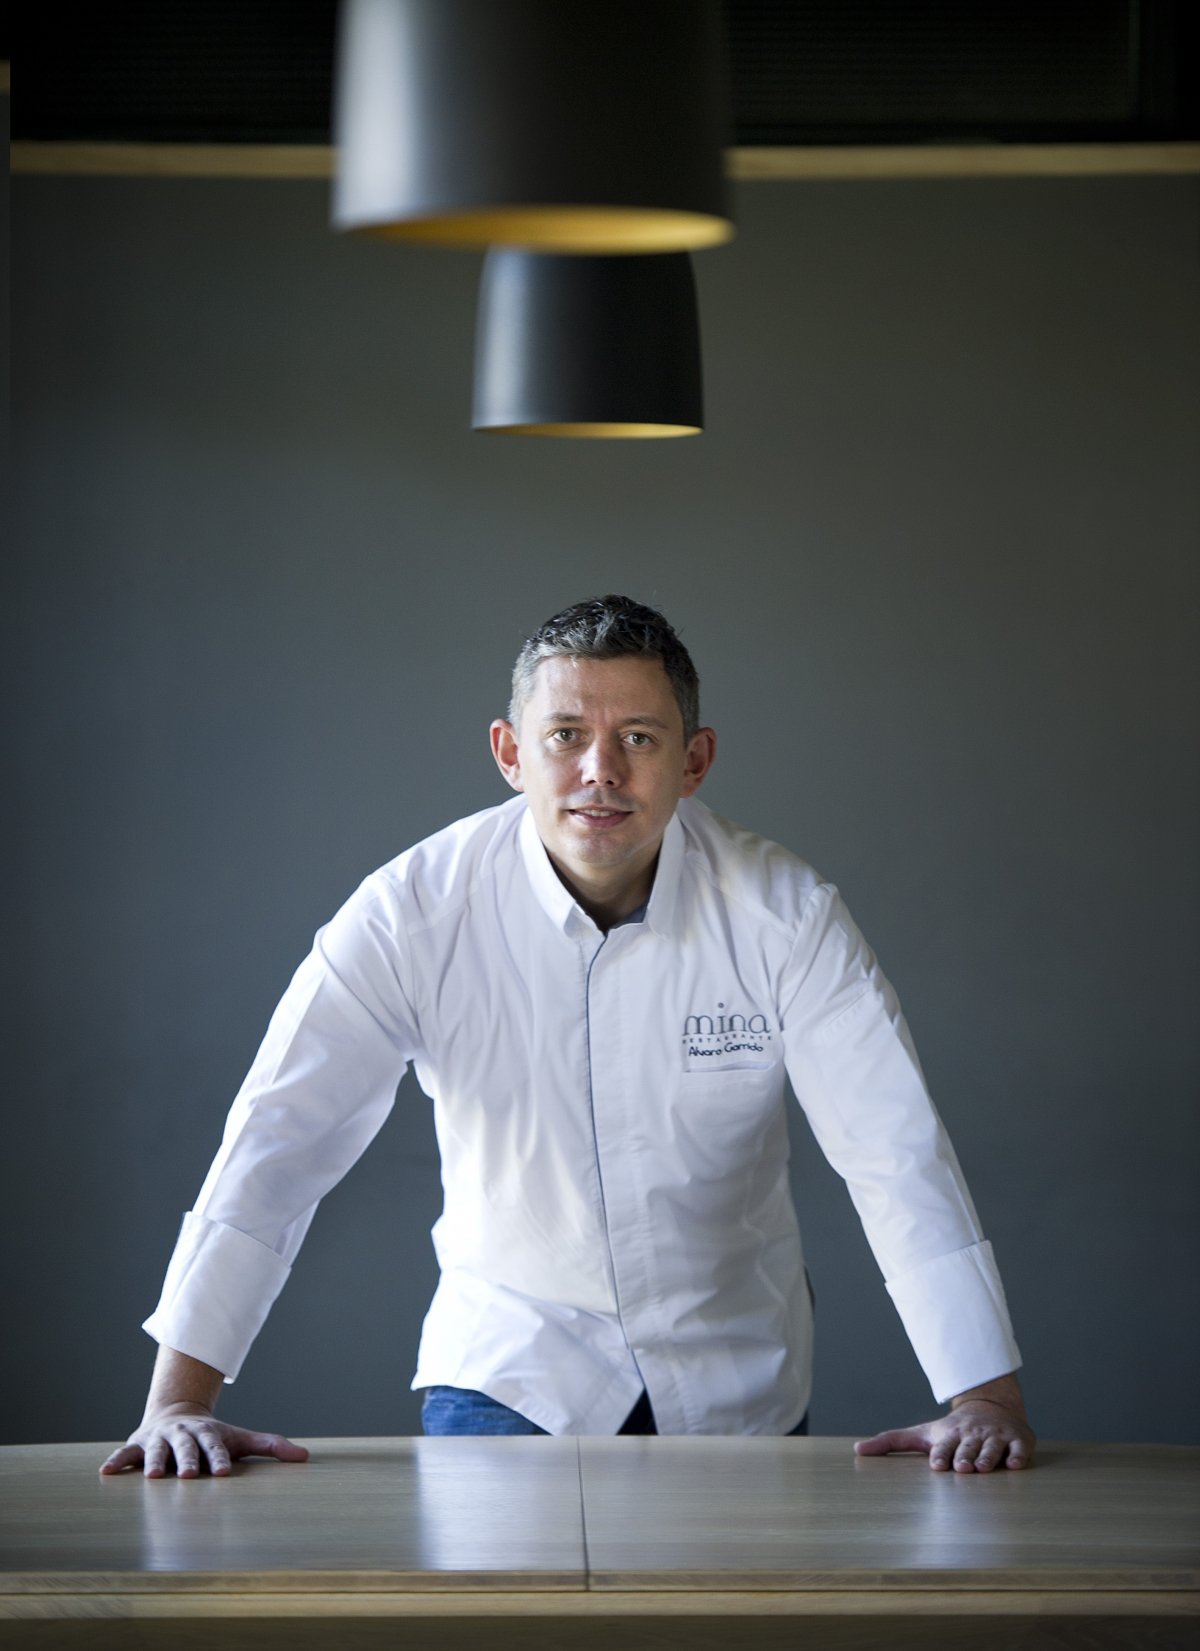 Álvaro Garrido, chef del restaurante Mina